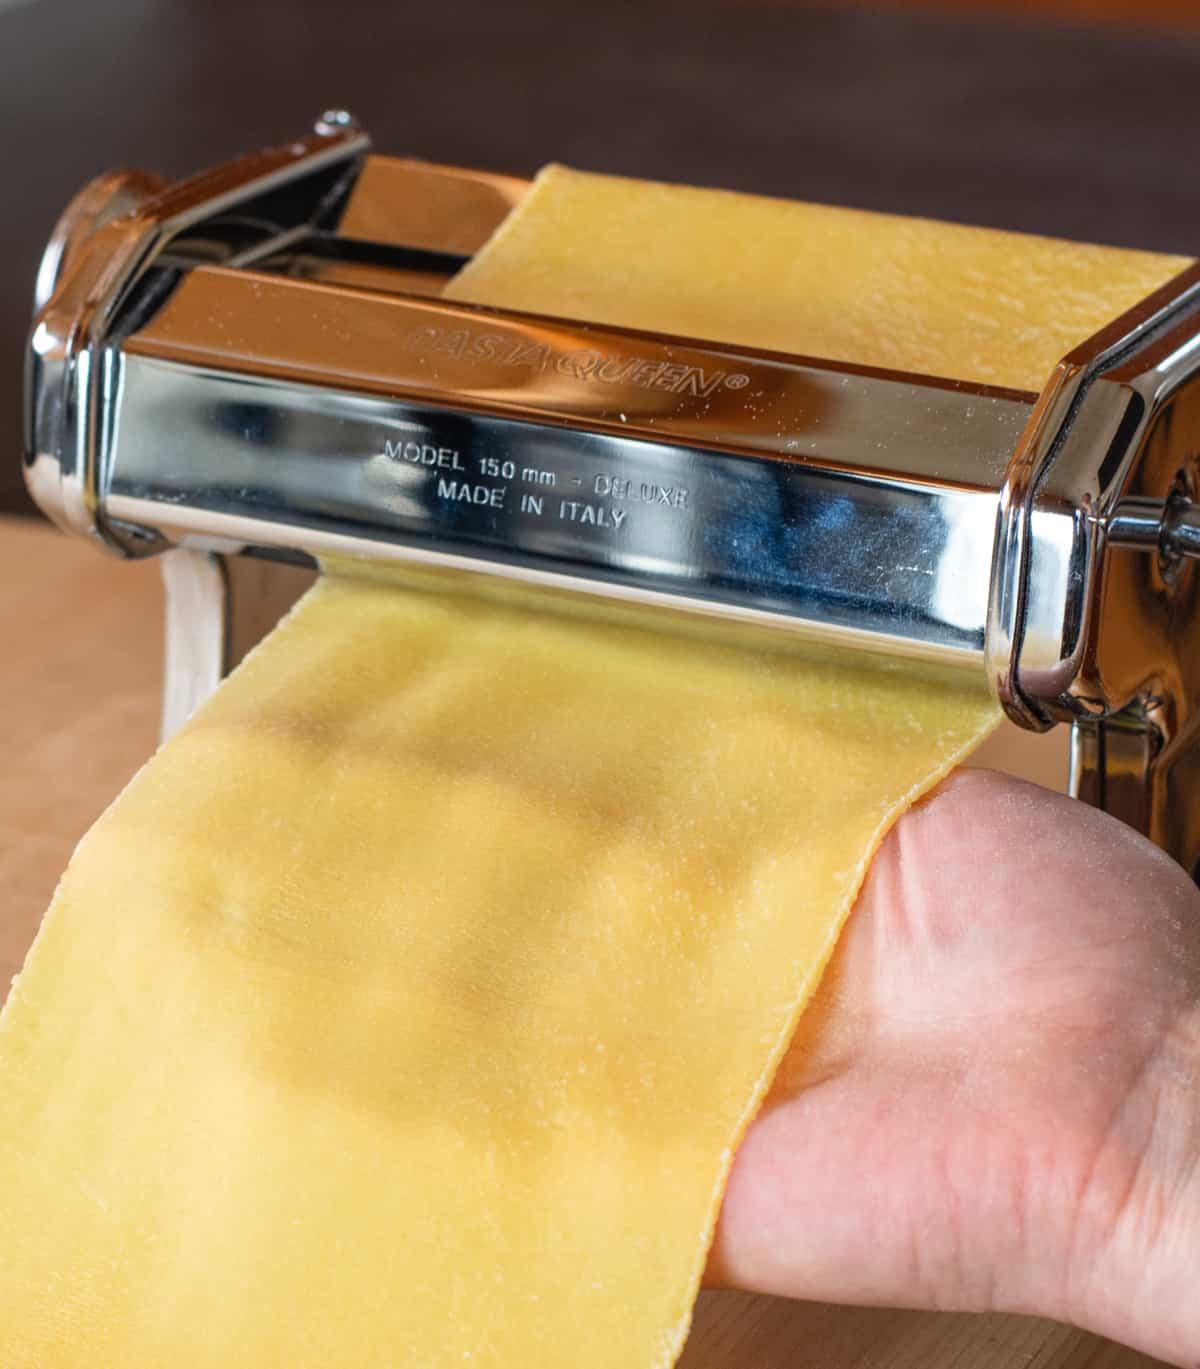 Final Pass of pasta dough through machine rollers